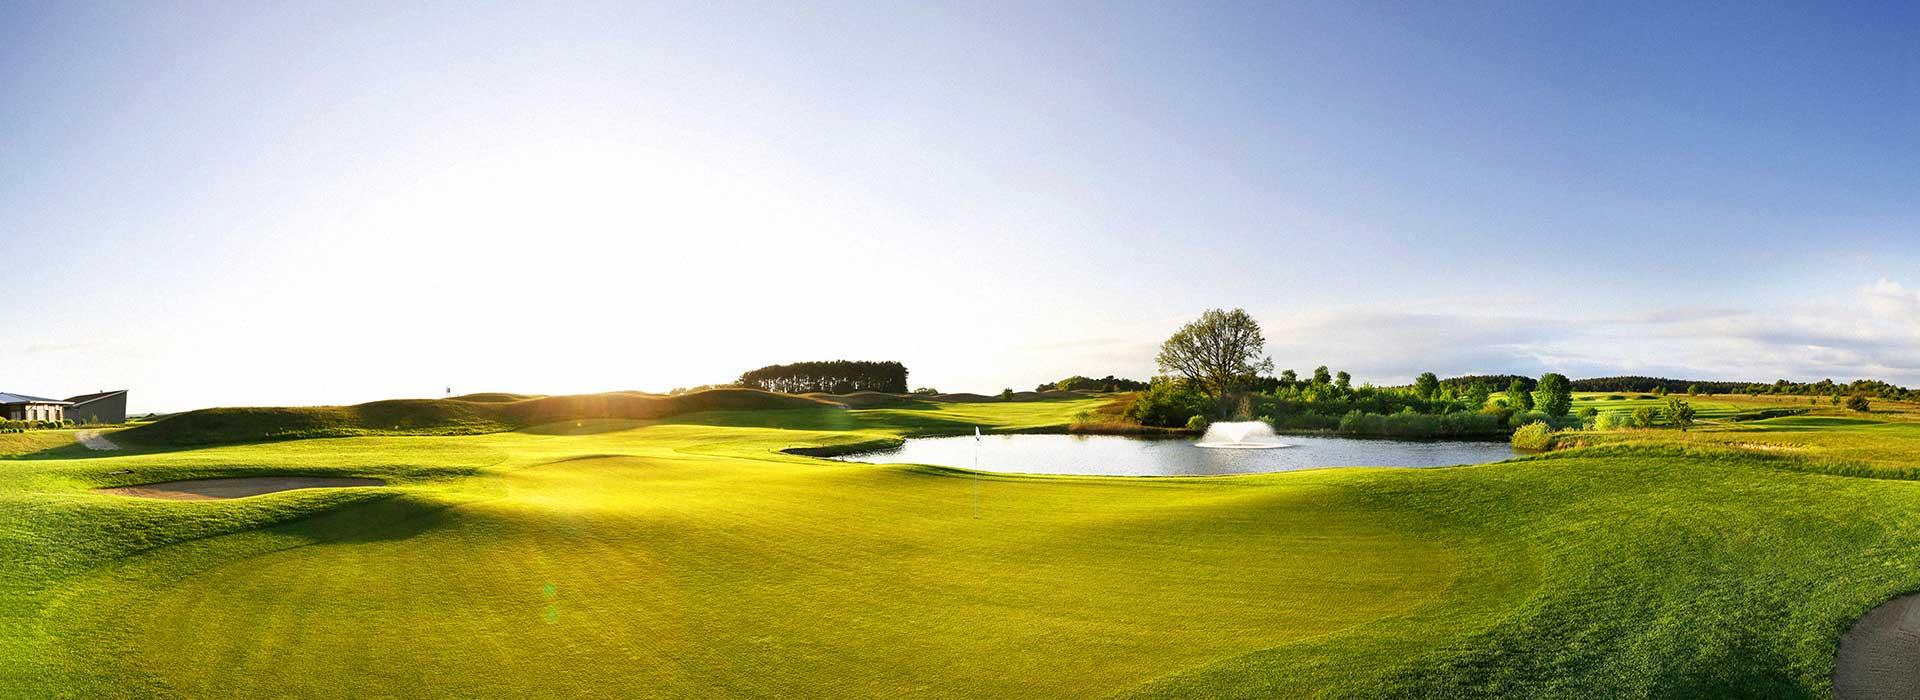 Helmut Mair Golf Bild Aktuelles